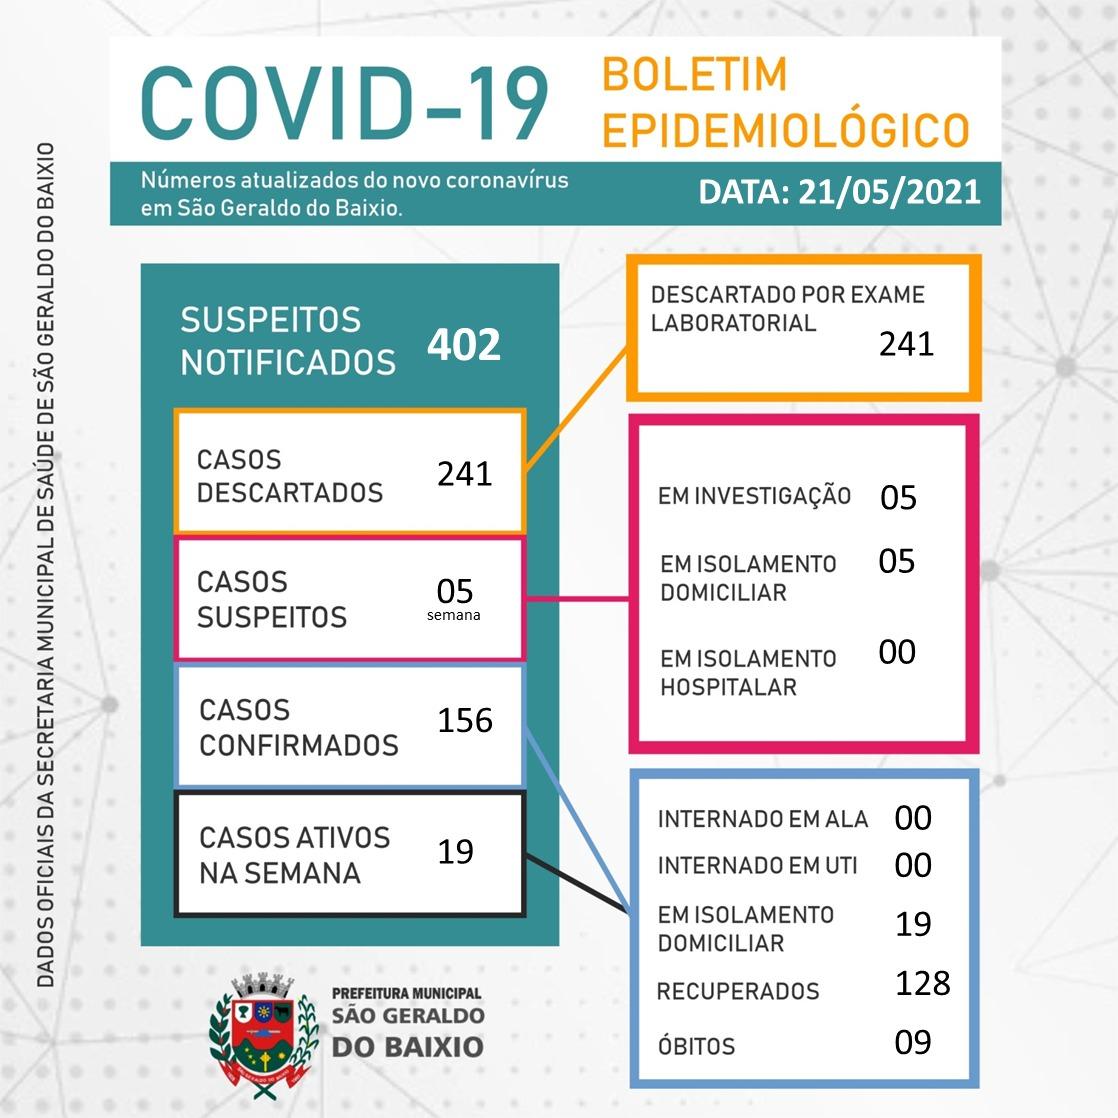 BOLETIM EPIDEMIOLÓGICO 21/05/2021